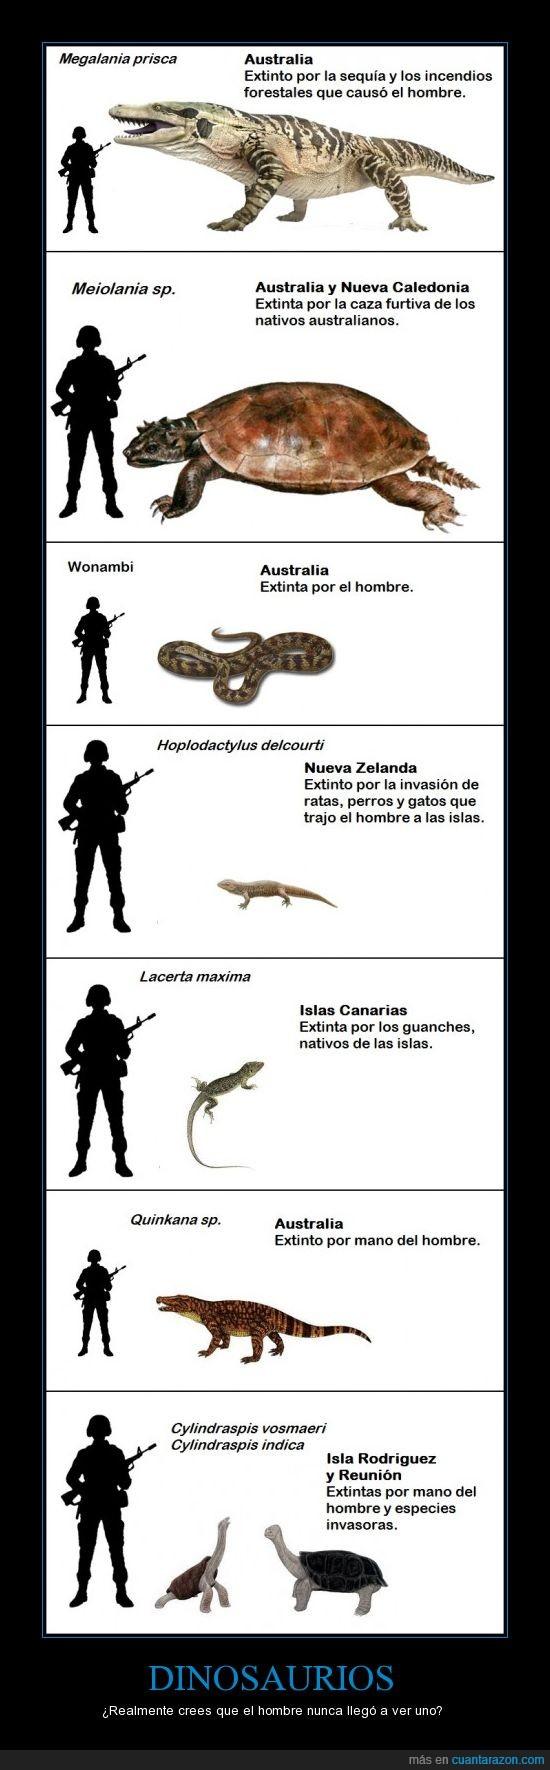 Dinosaurios,megalania,meiolania,quinkana,reptiles,wonambi